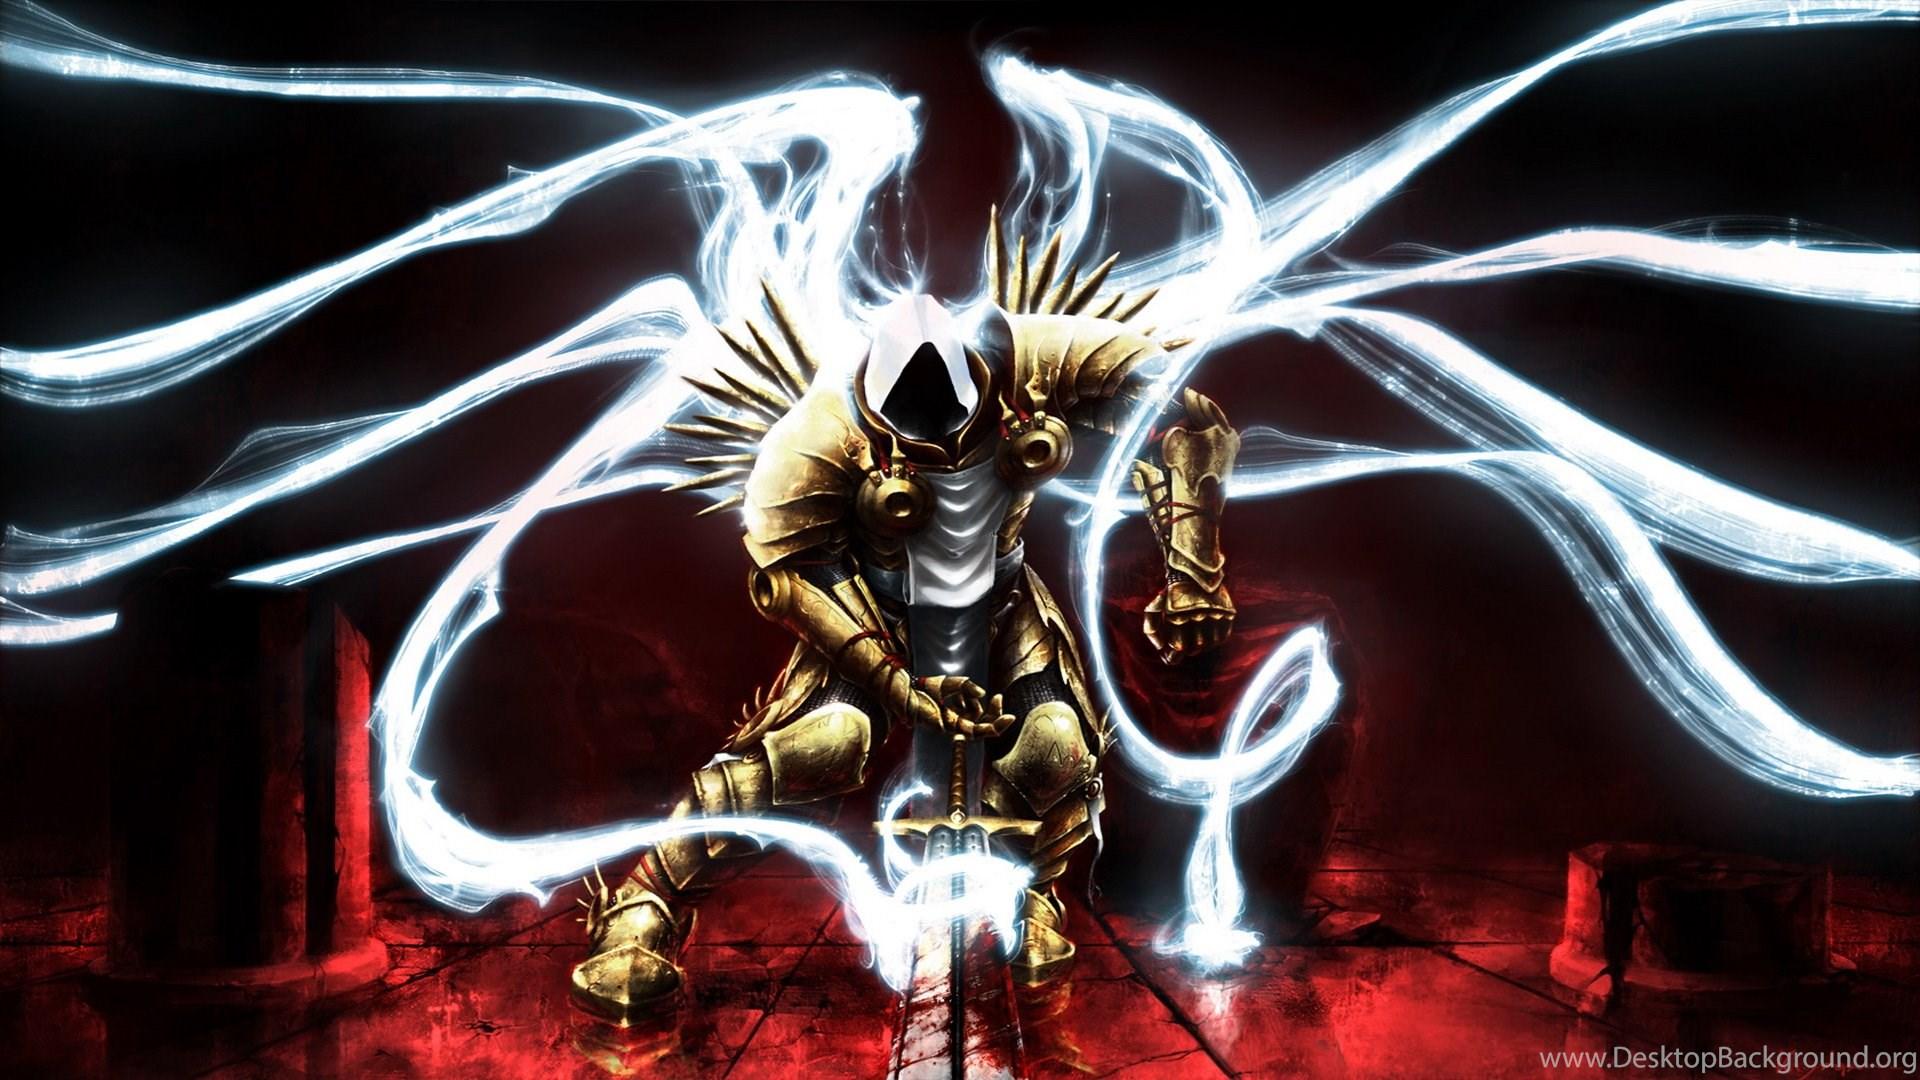 PC Game Wallpapers HD 1080P Video Games Diablo Iii Archangel